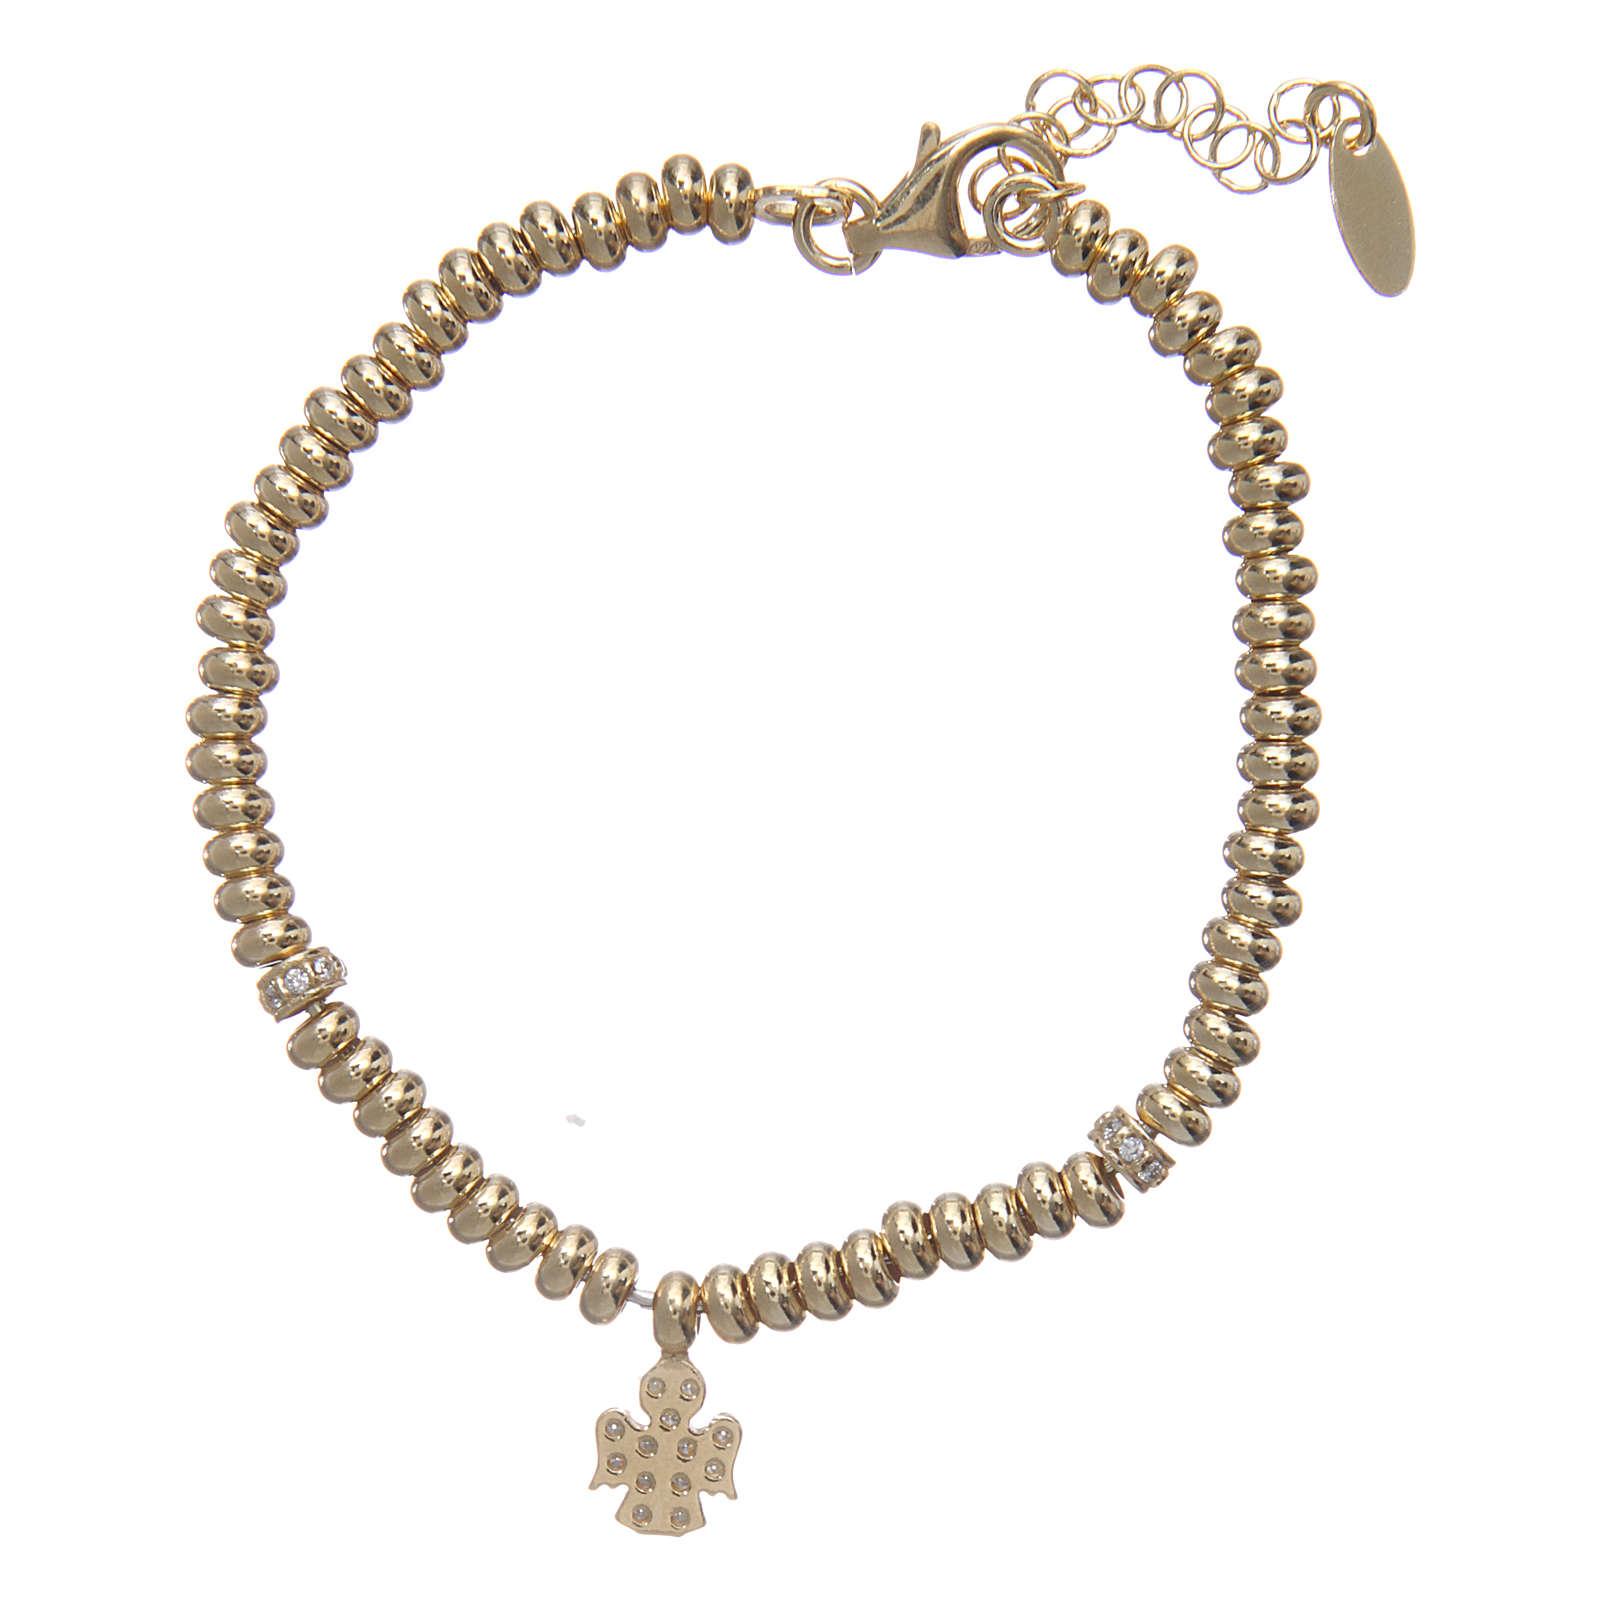 Bracciale AMEN in argento 925 oro angelo zirconato 4